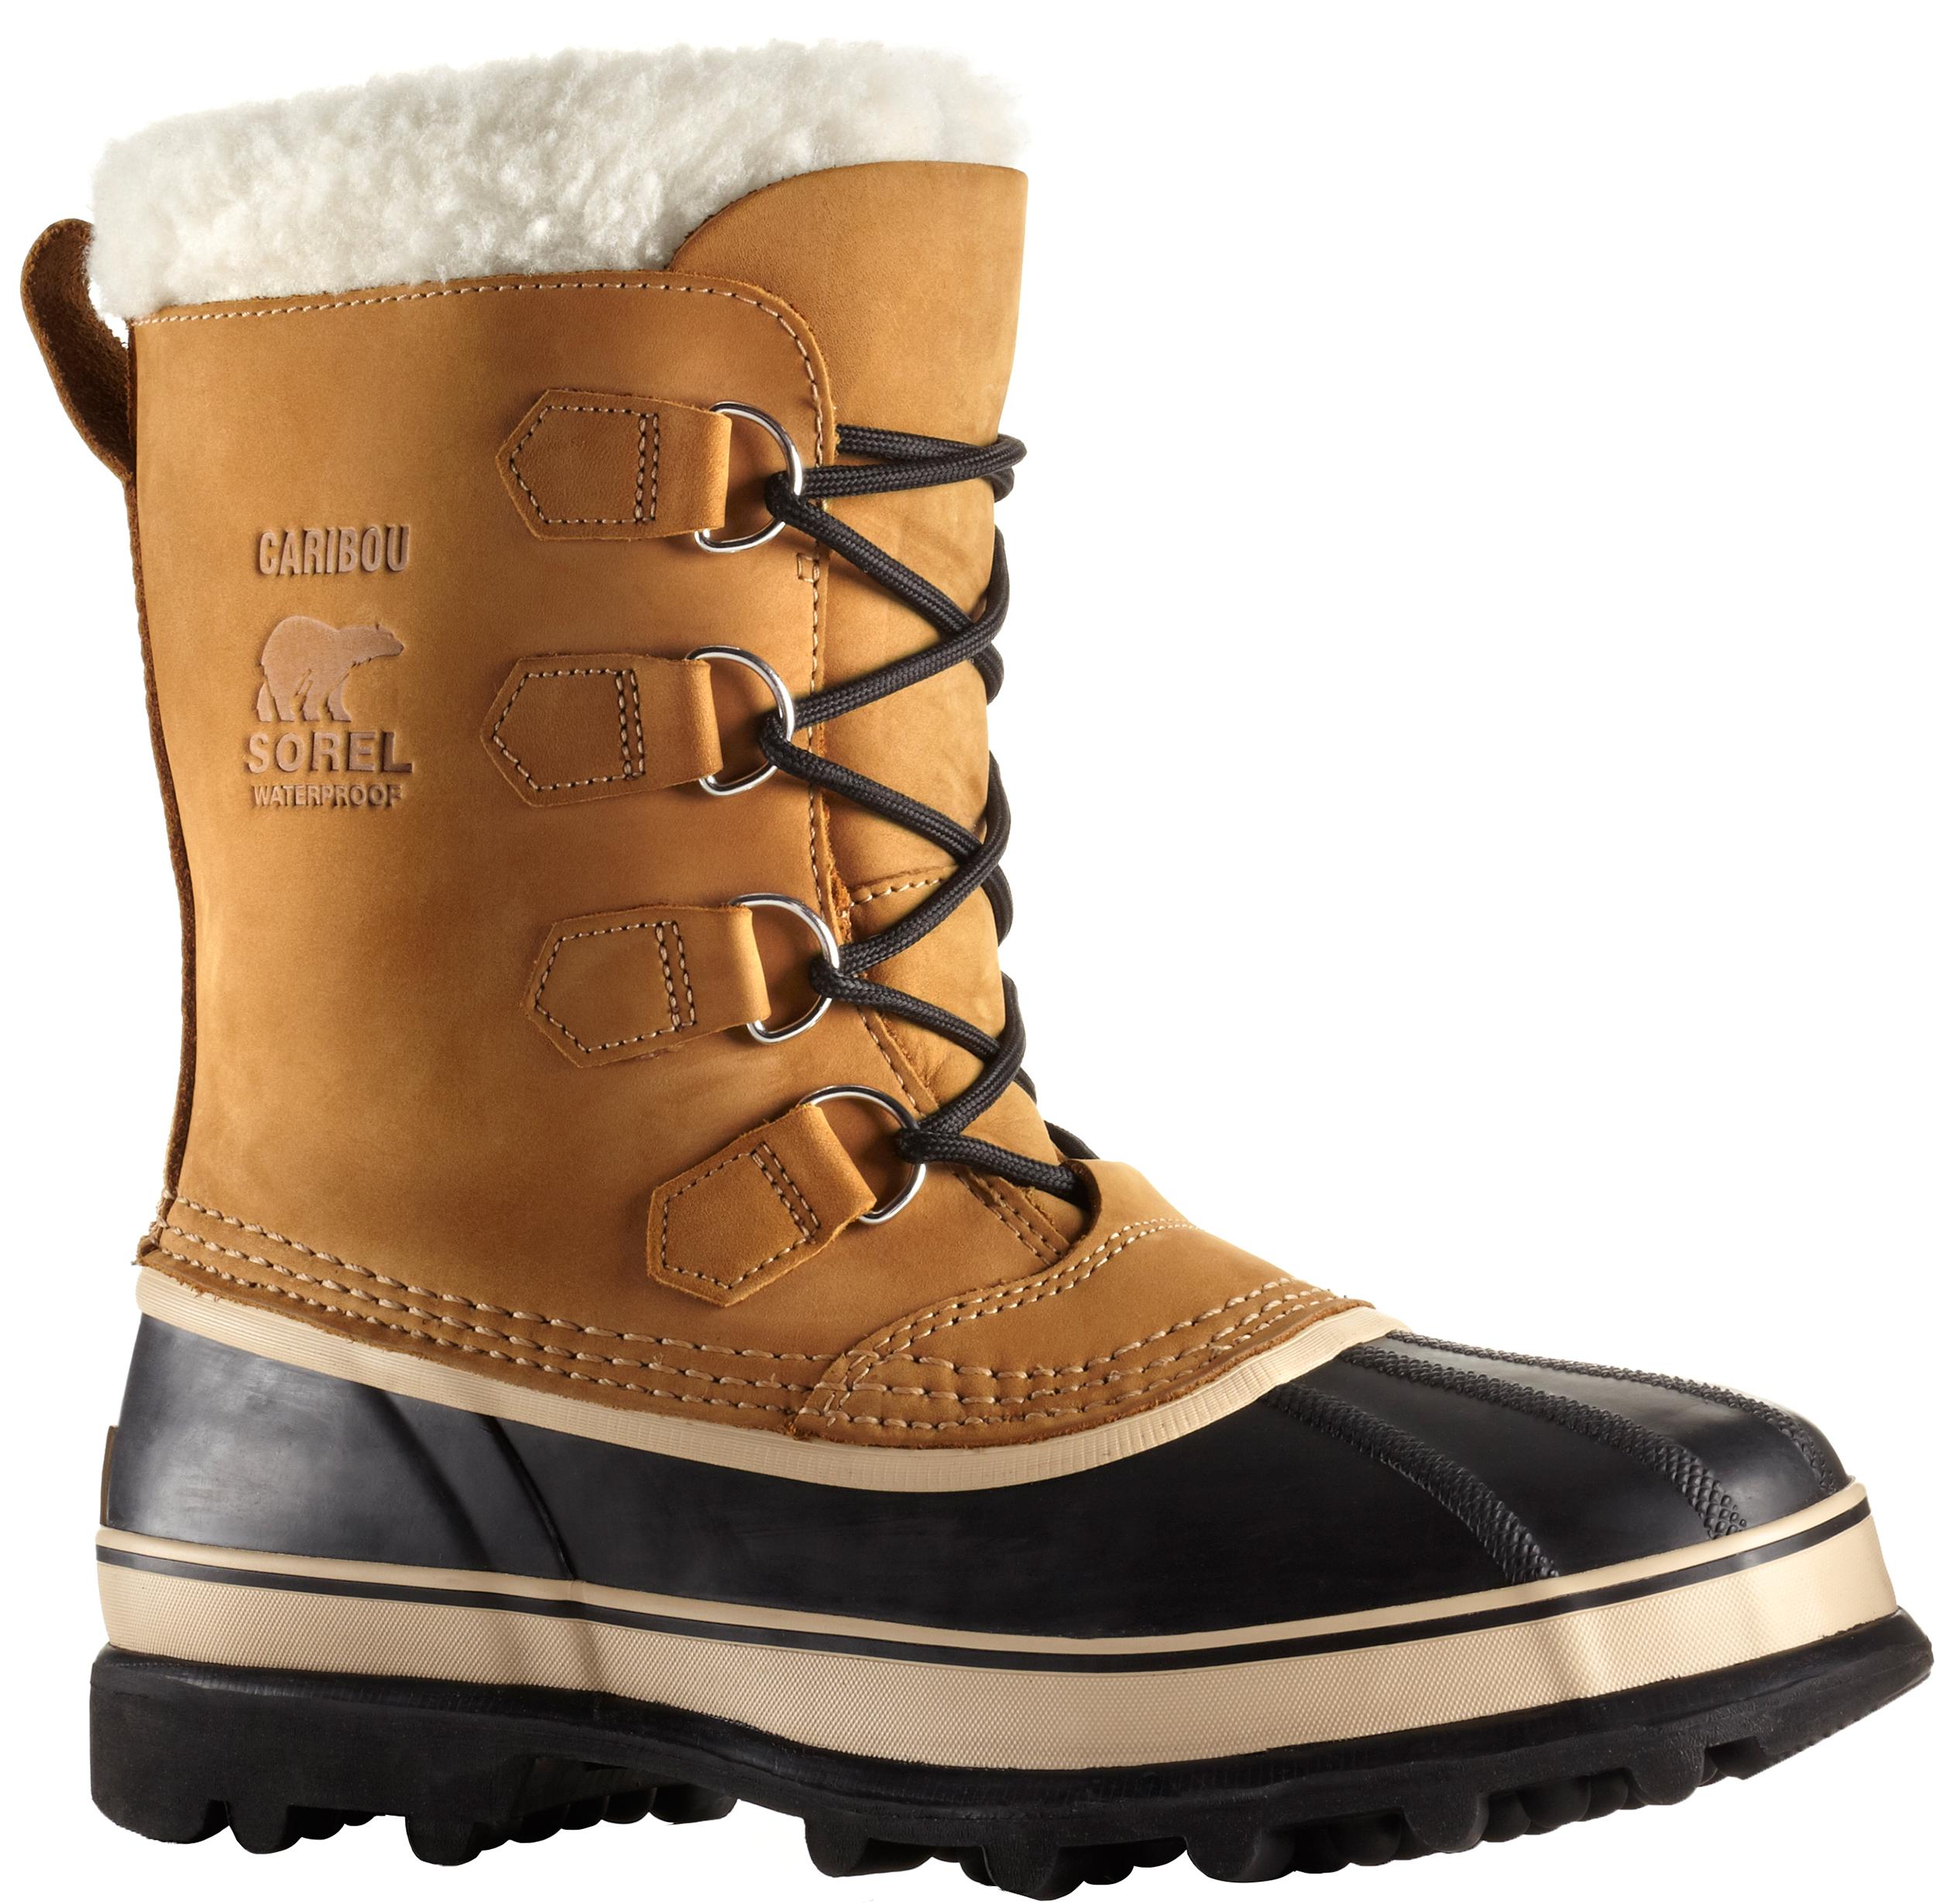 Sorel Caribou Waterproof Winter Boots